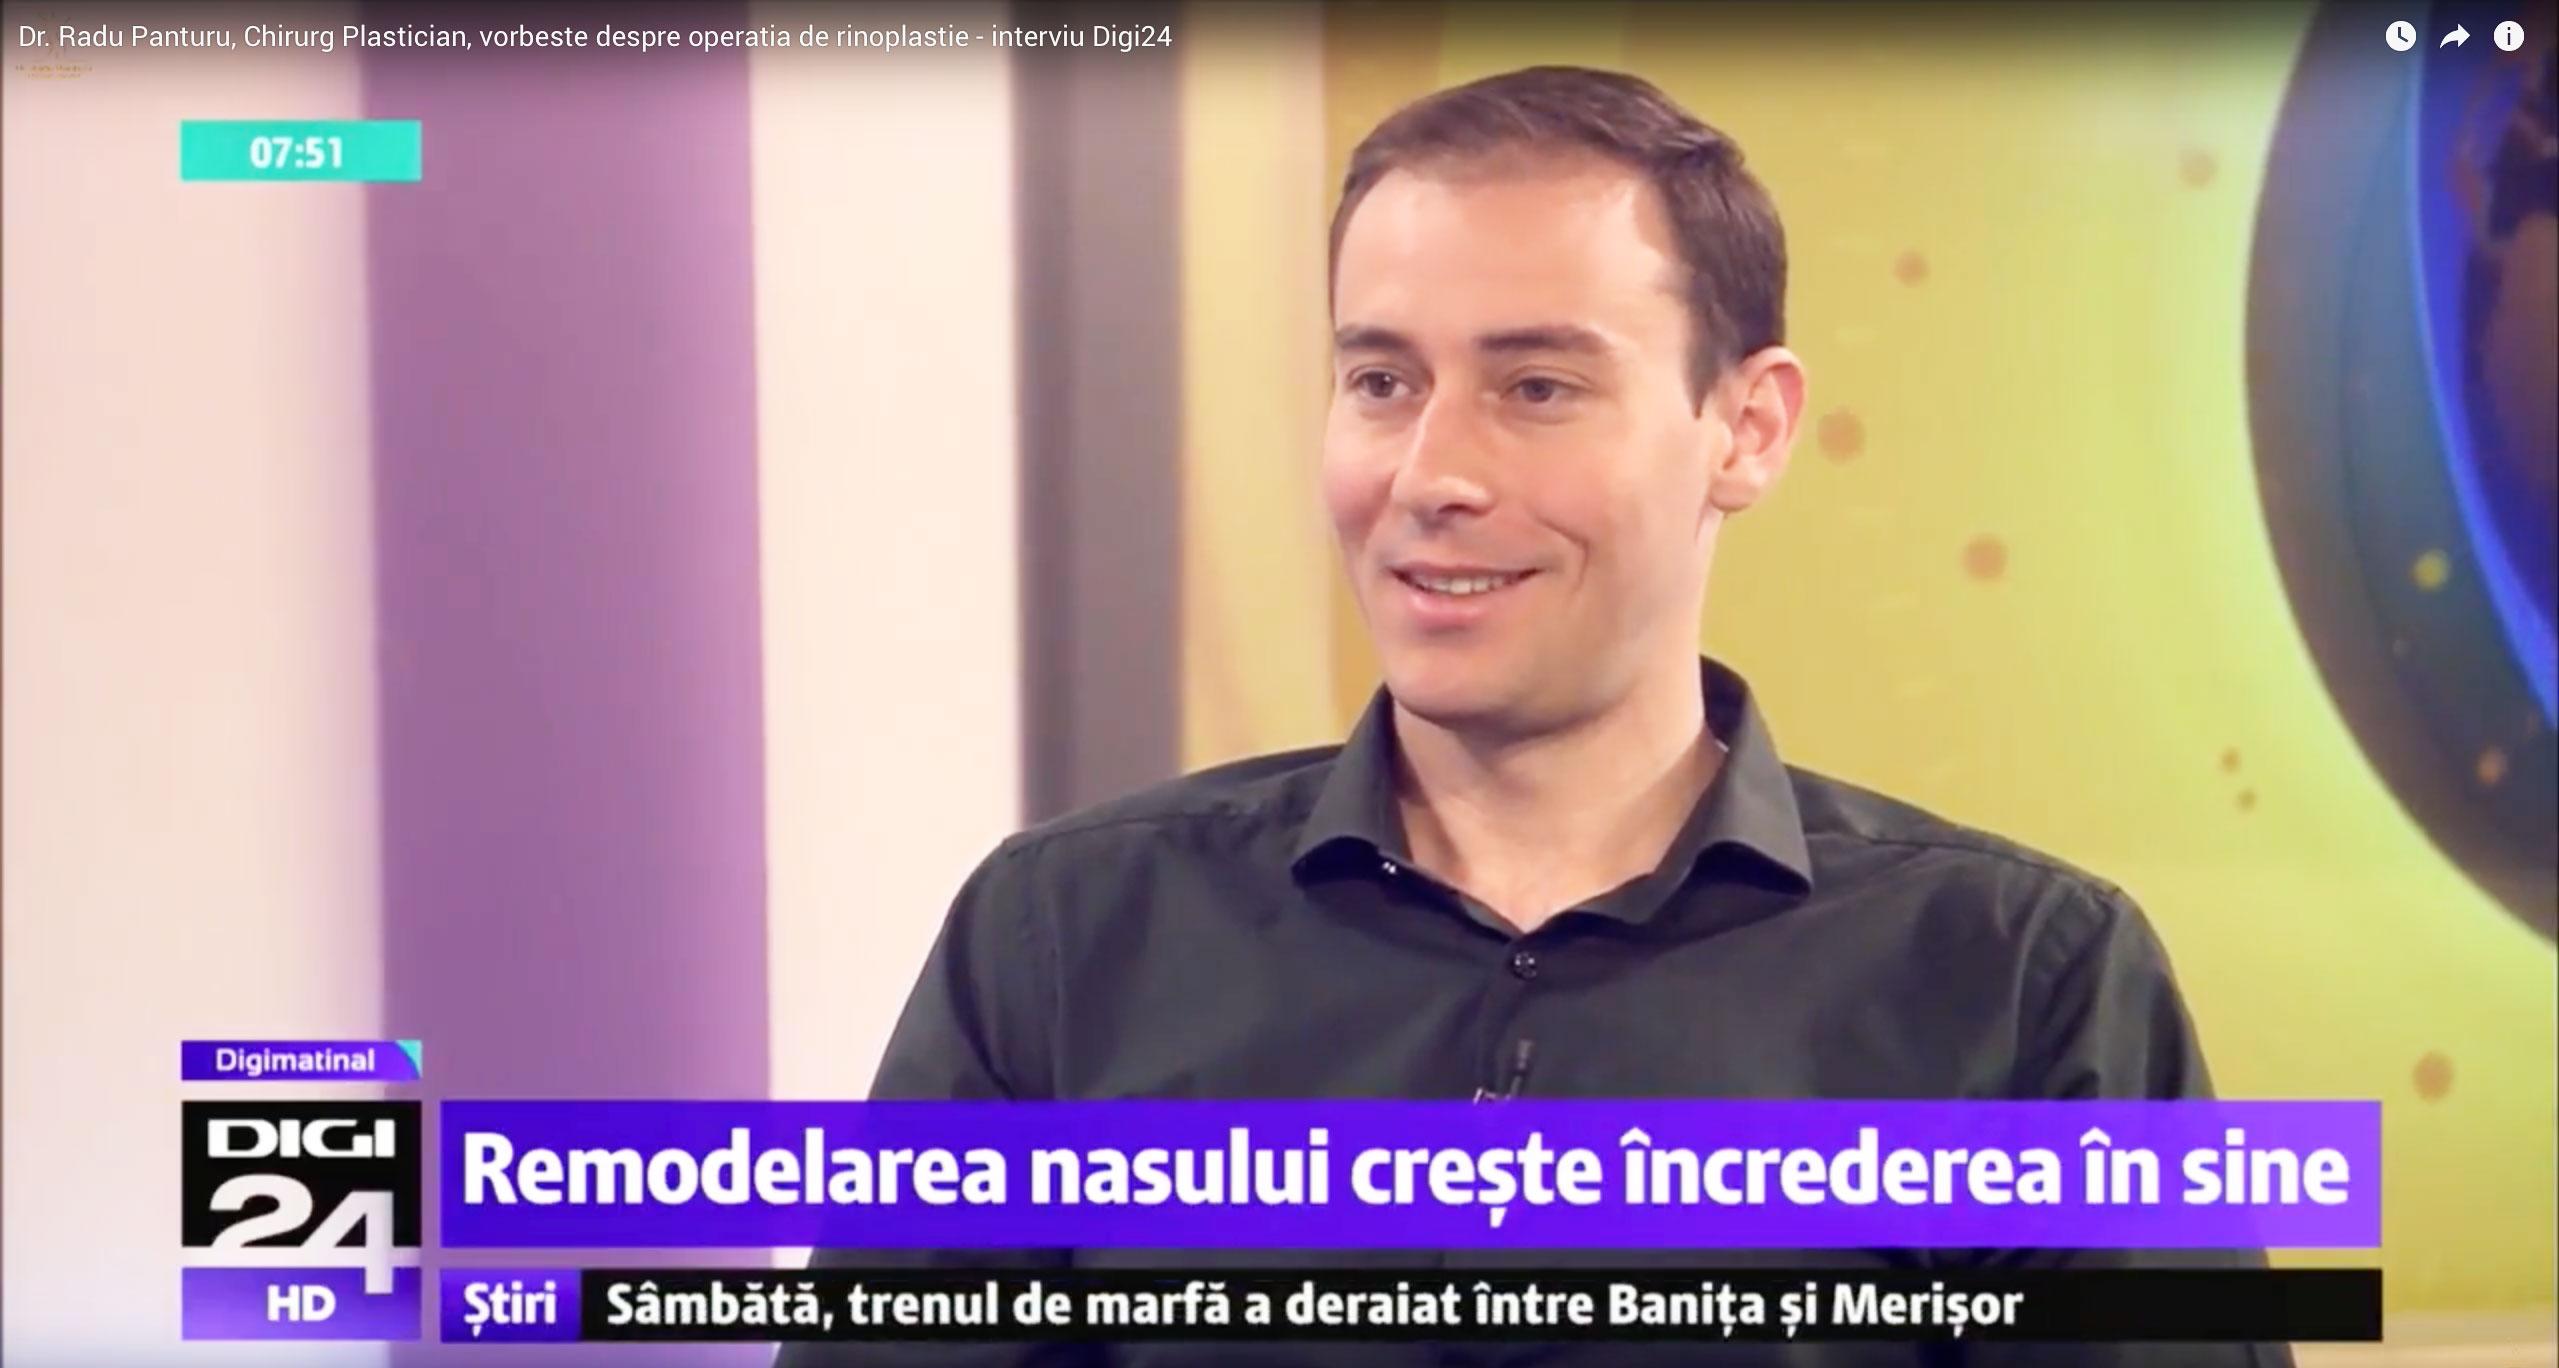 Avantaje si riscuri rinoplastie interviu Dr. Radu Panturu la Digi 24 Matinal